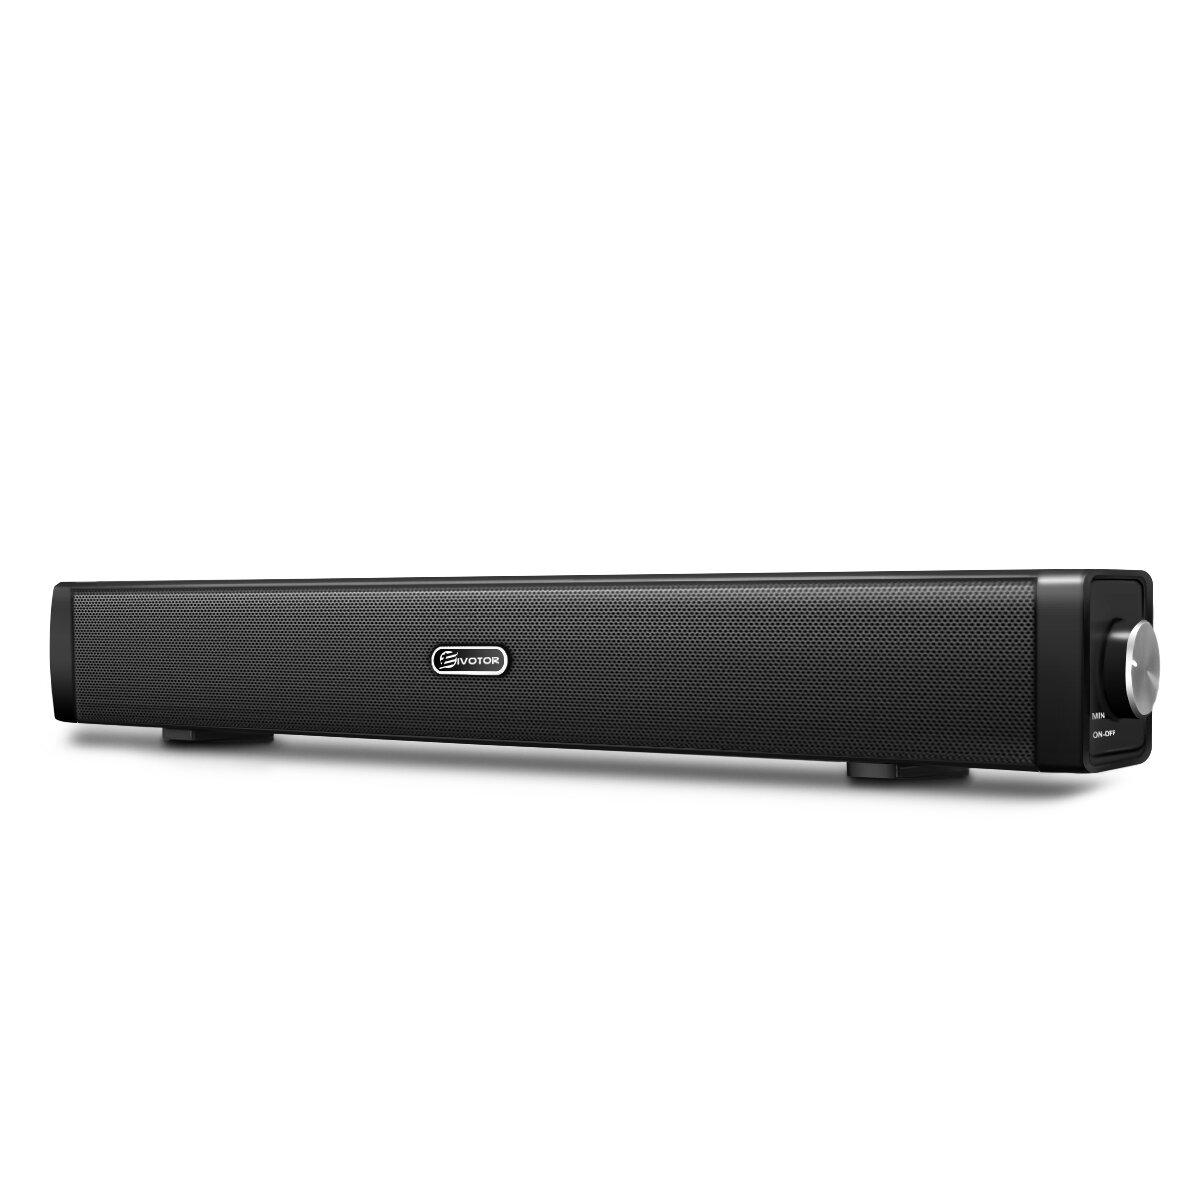 EIVOTOR USB Mini bluetooth Soundbar Speaker for Computer Desktop Laptop